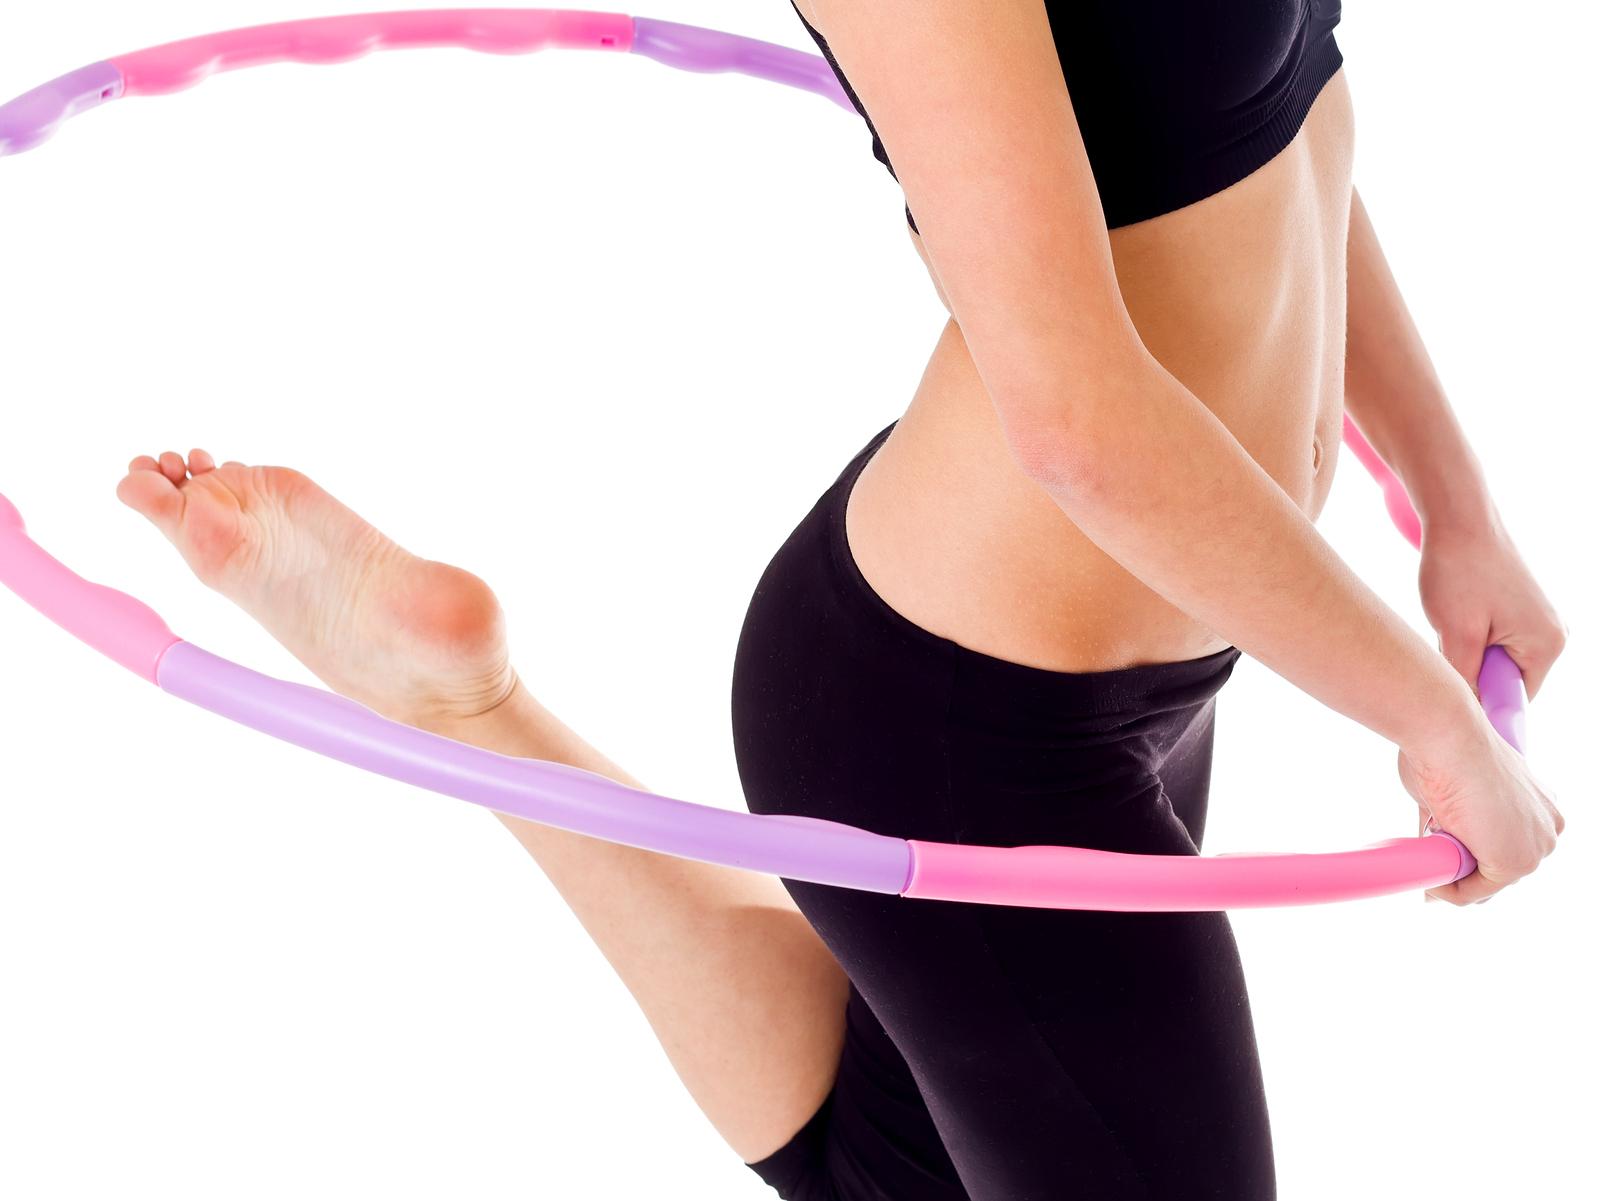 jak kręcić hula hop - ćwiczenia